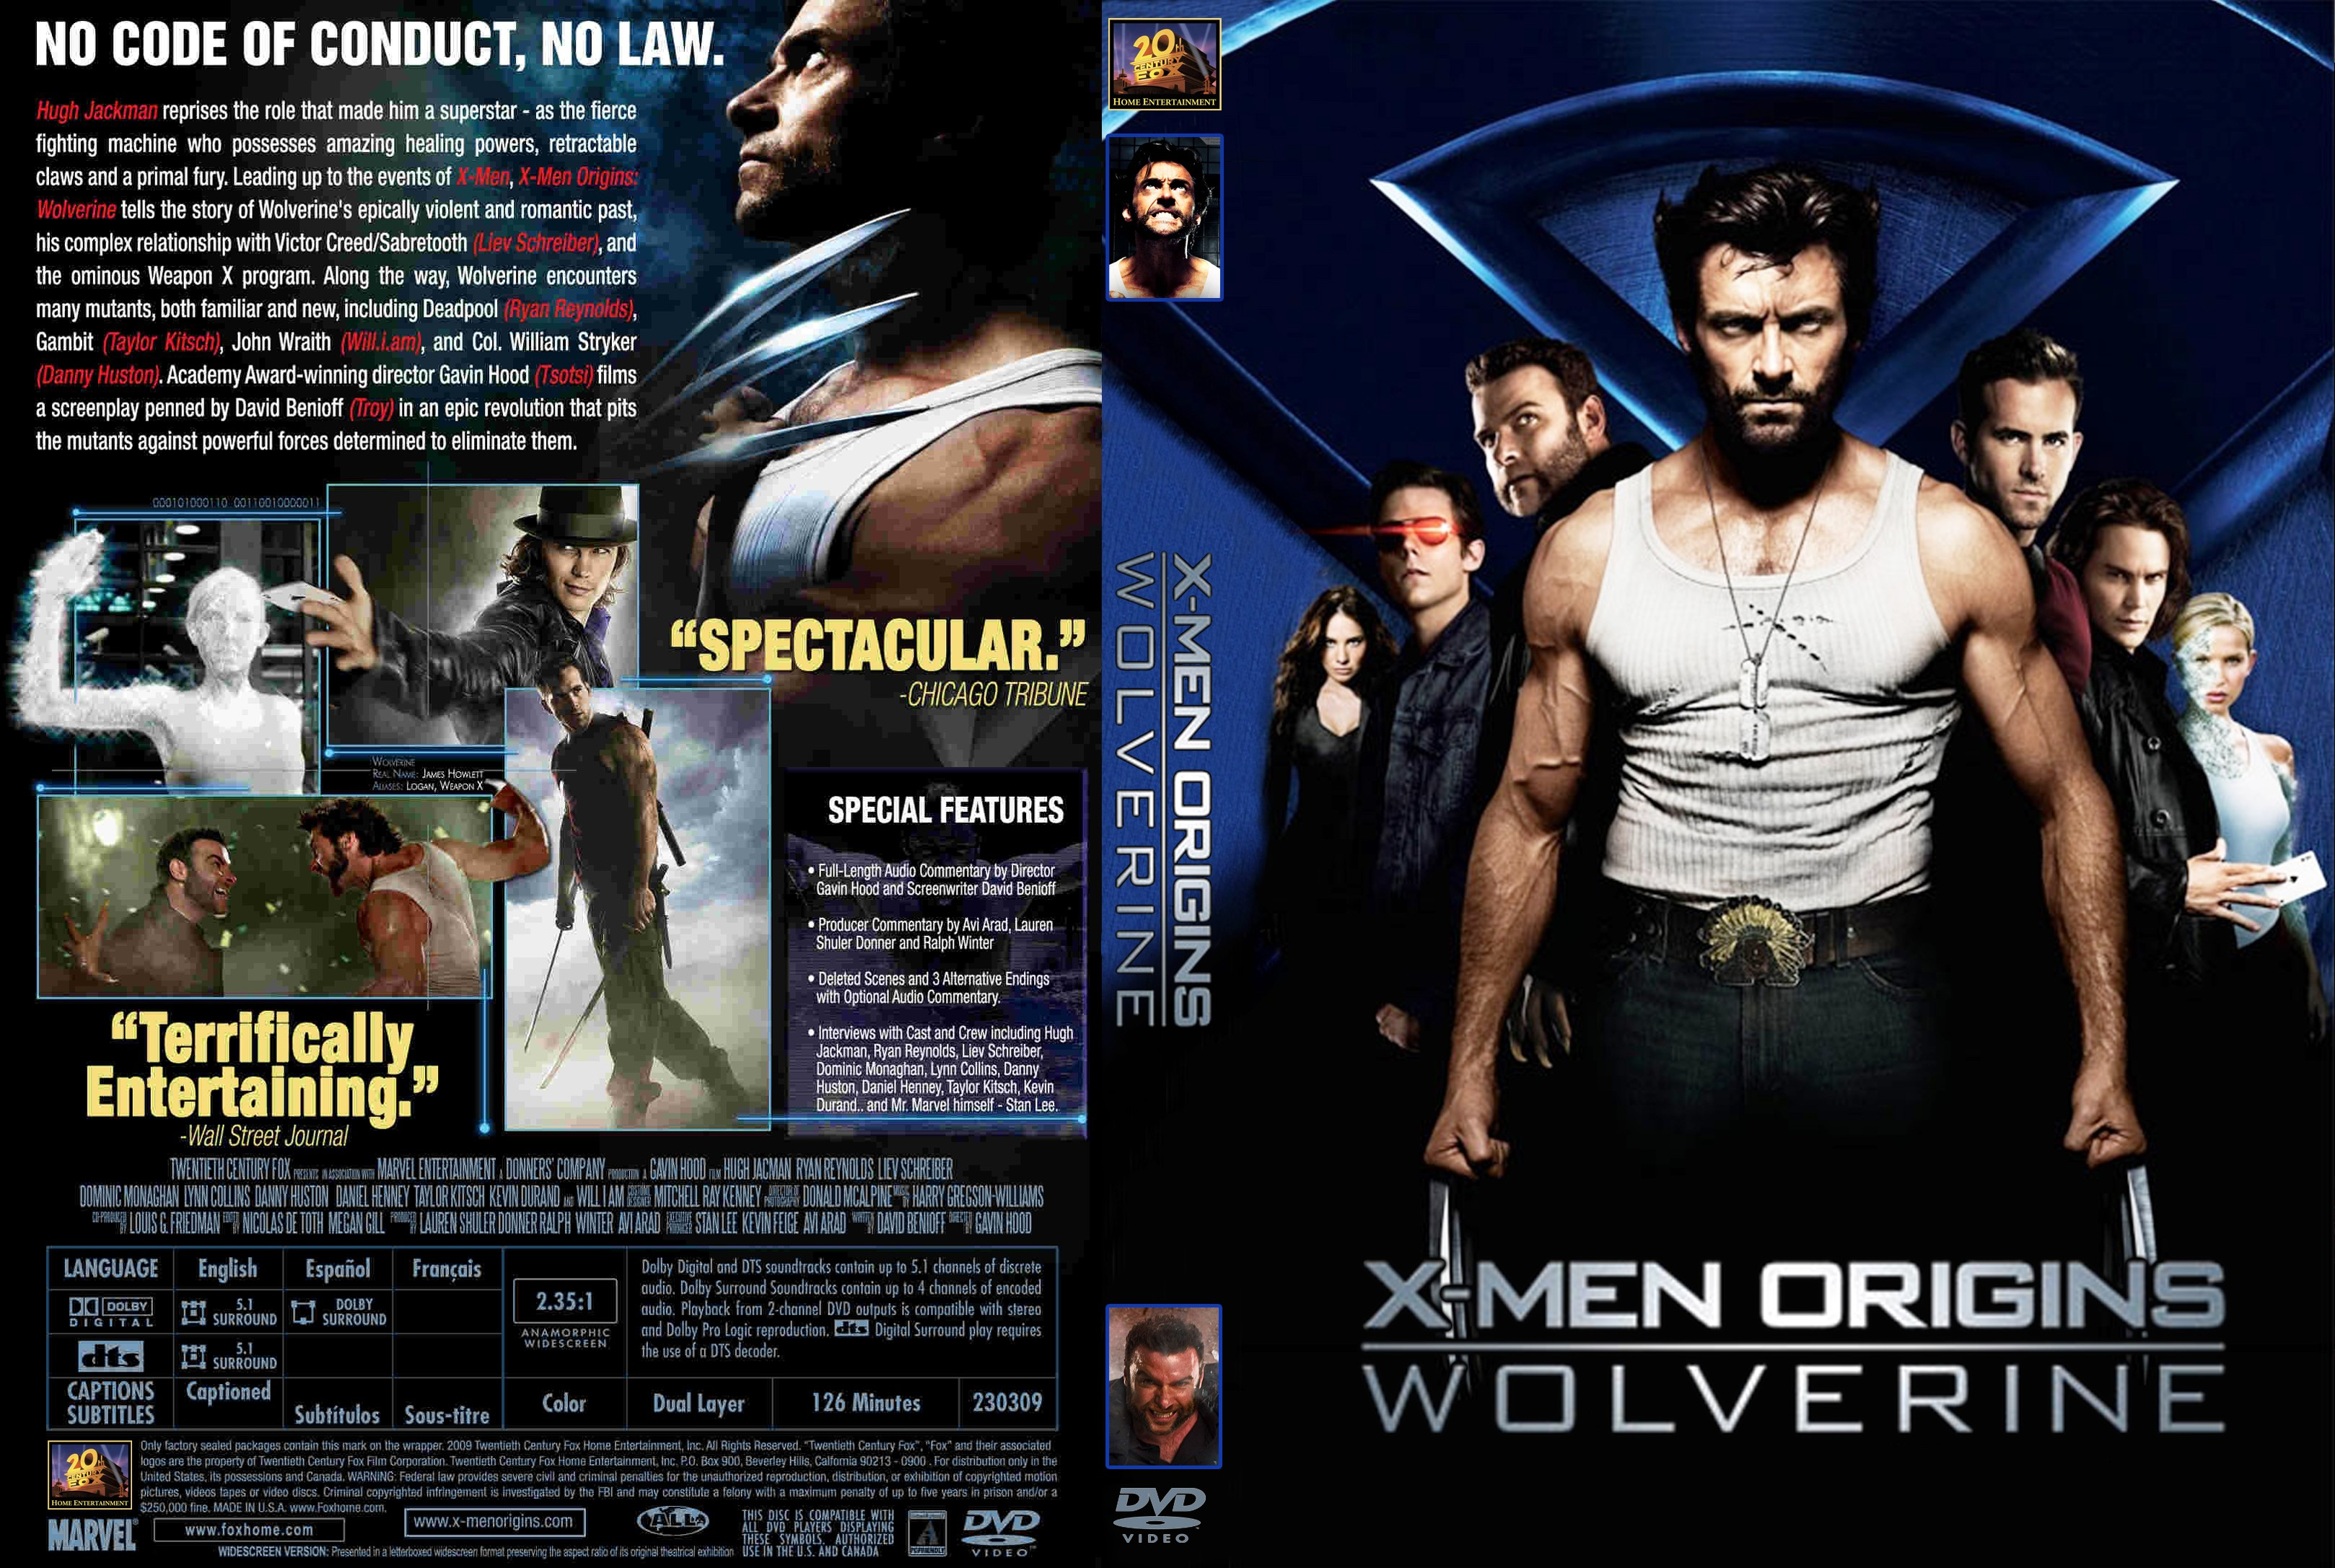 x-men origins wolverine full hd movie hindi dubbed